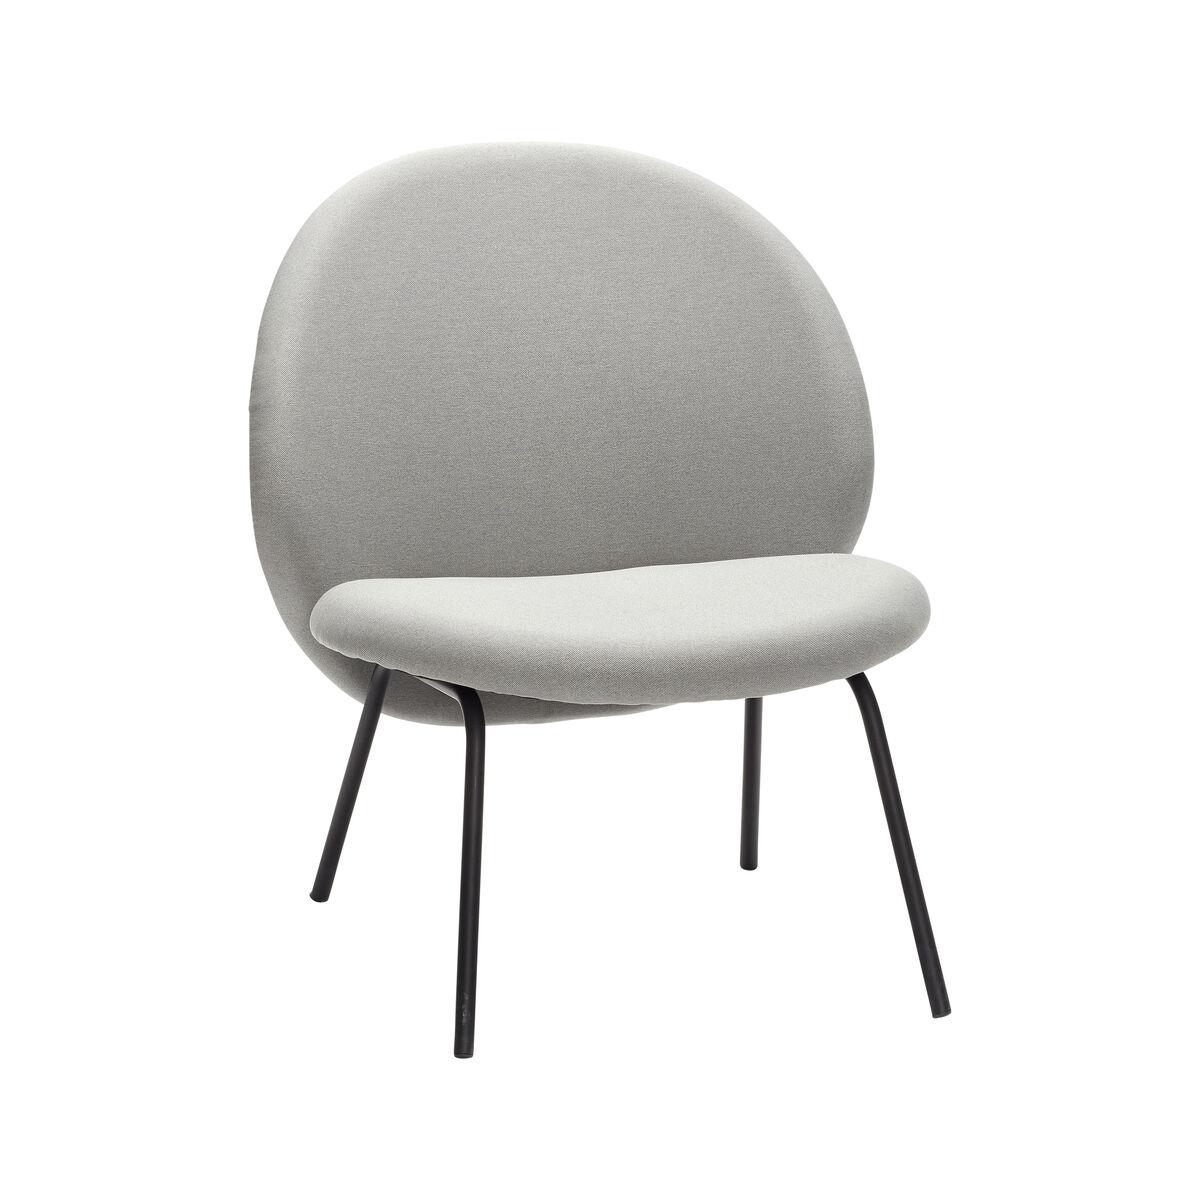 Lounge Chair, Metal Legs, Black/Grey » Hübsch With Regard To Lounge Chairs With Metal Leg (View 11 of 15)